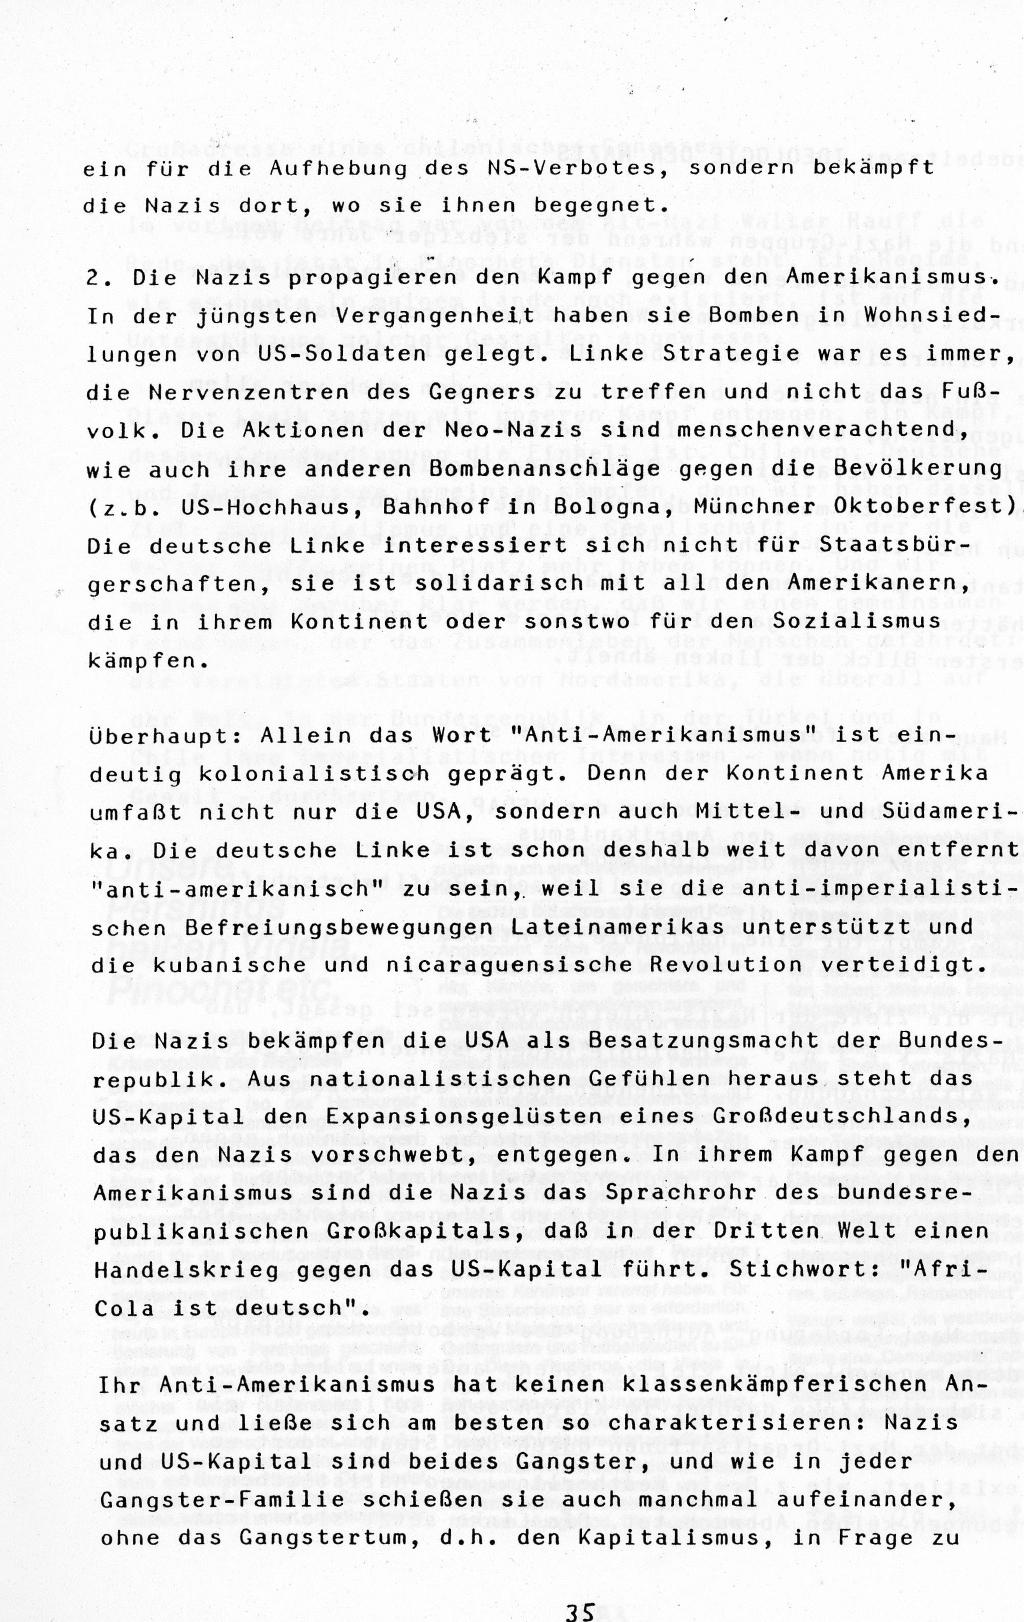 Berlin_1983_Autonome_Gruppen_Faschismus_im_Kapitalismus_35